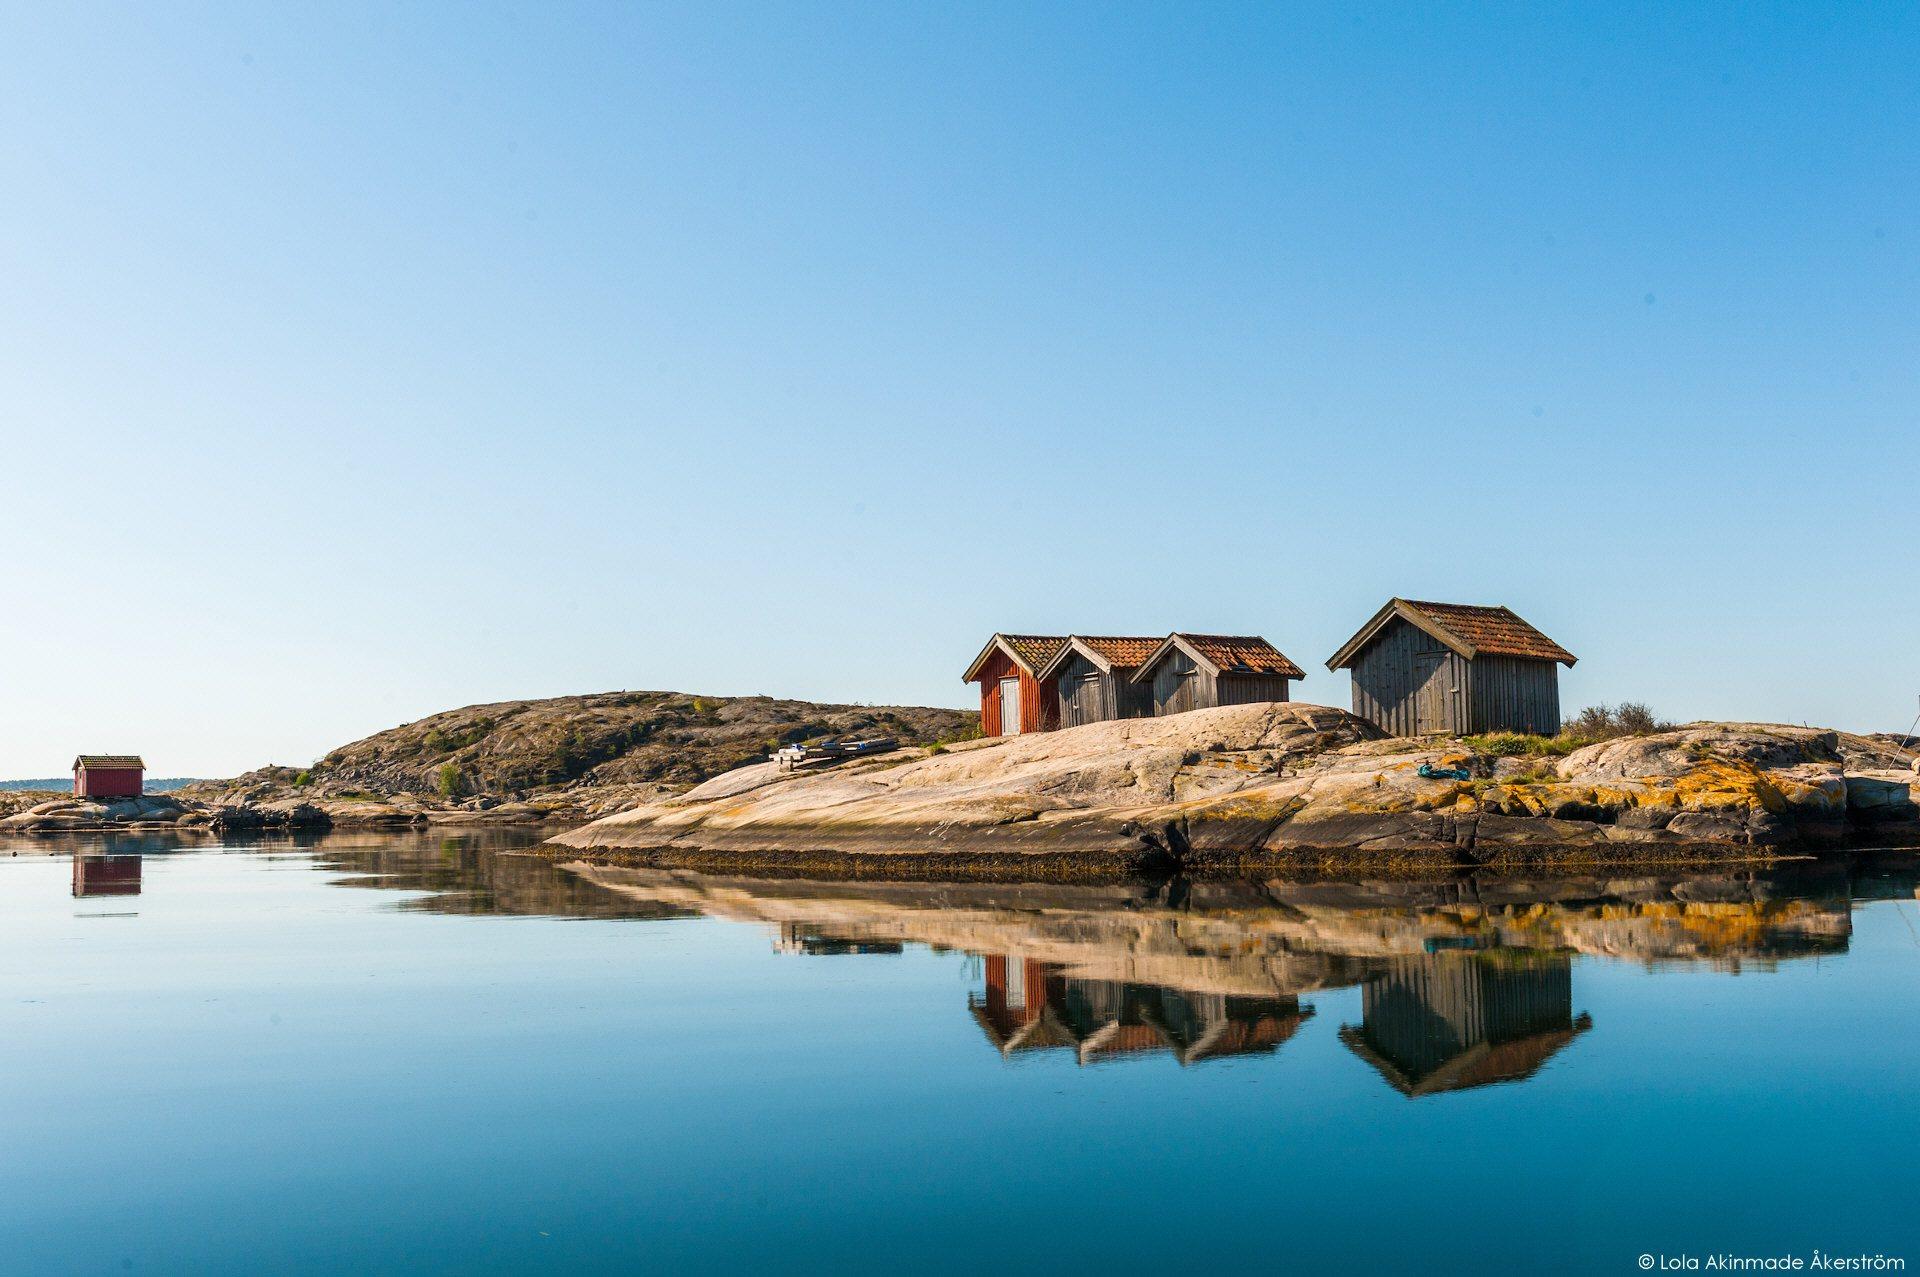 Grebbestad, West Sweden